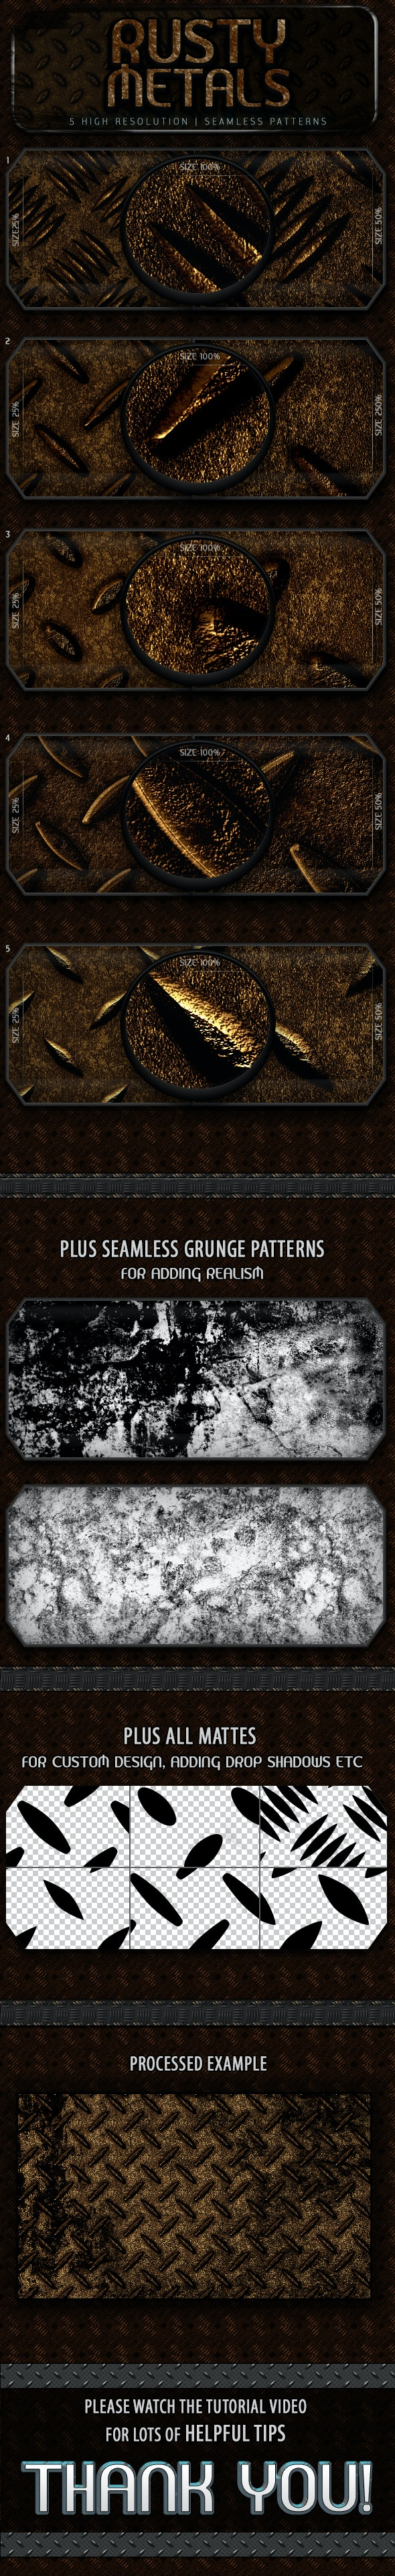 Rusty Metal Patterns - Urban Textures / Fills / Patterns